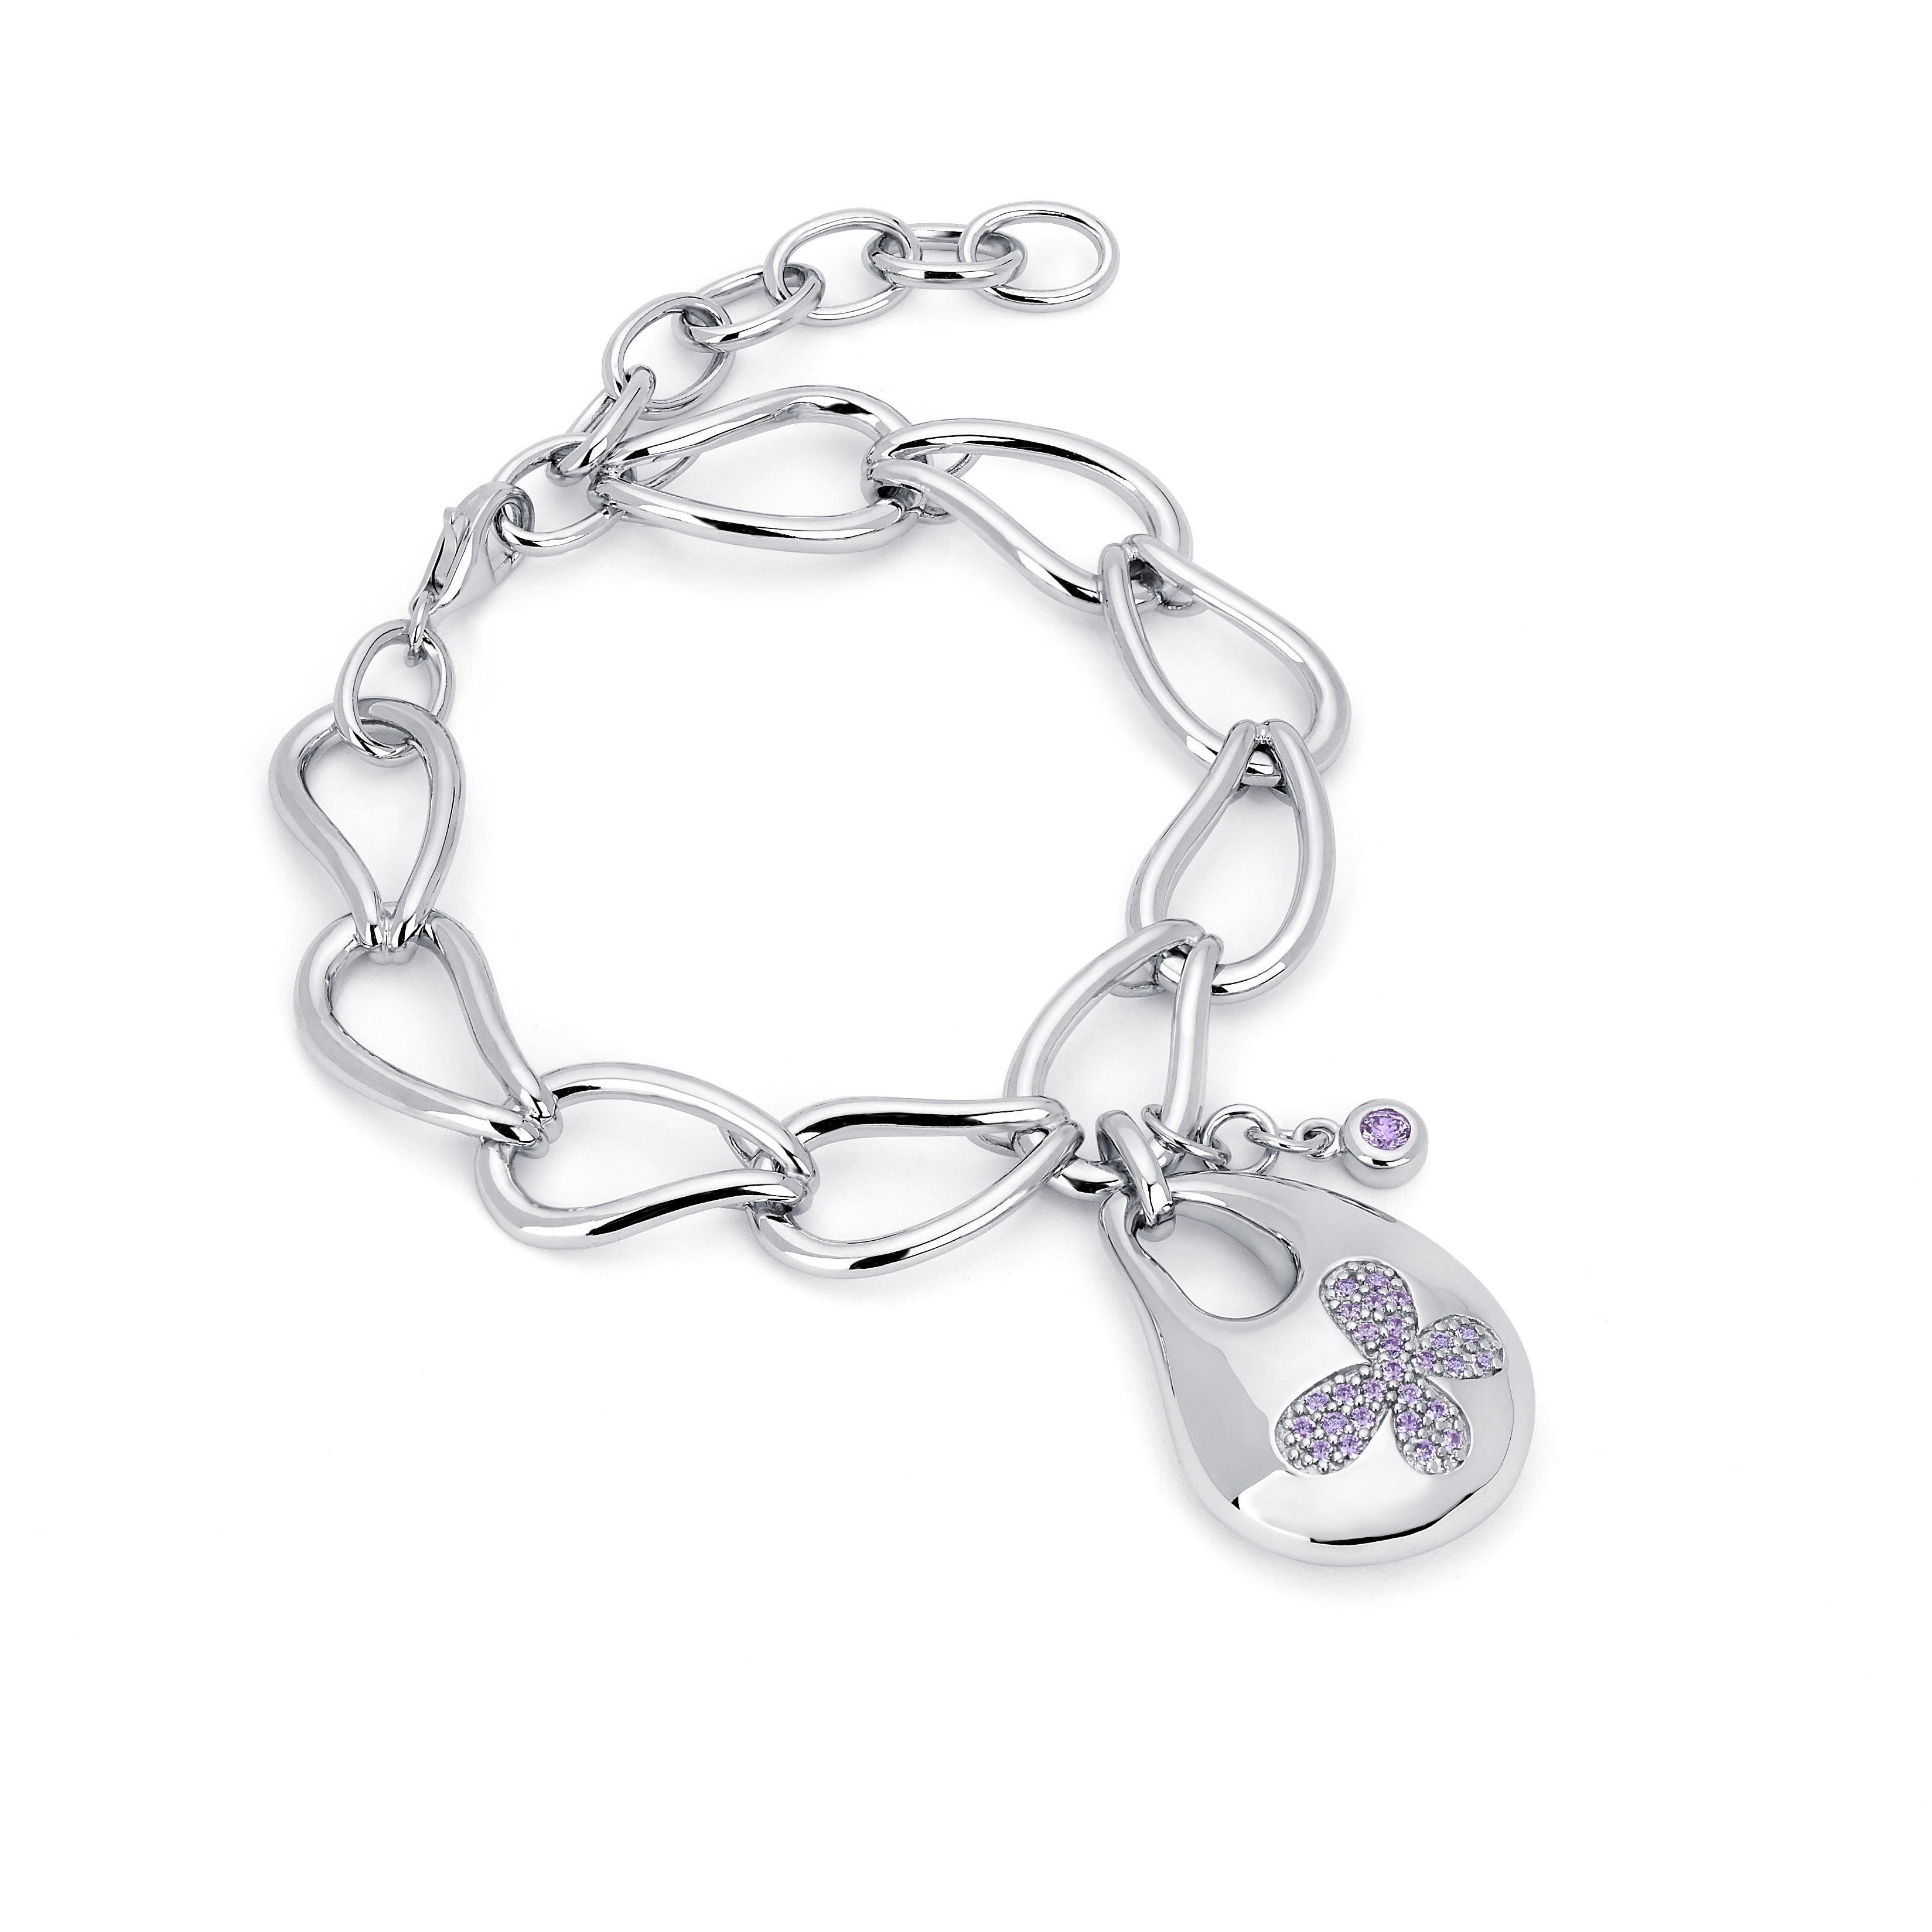 68d729e2f Shop Lotopia 925 Sterling Silver Purple Swarovski elements Zirconia Bold  Butterfly Bracelet - On Sale - Free Shipping Today - Overstock - 10111983